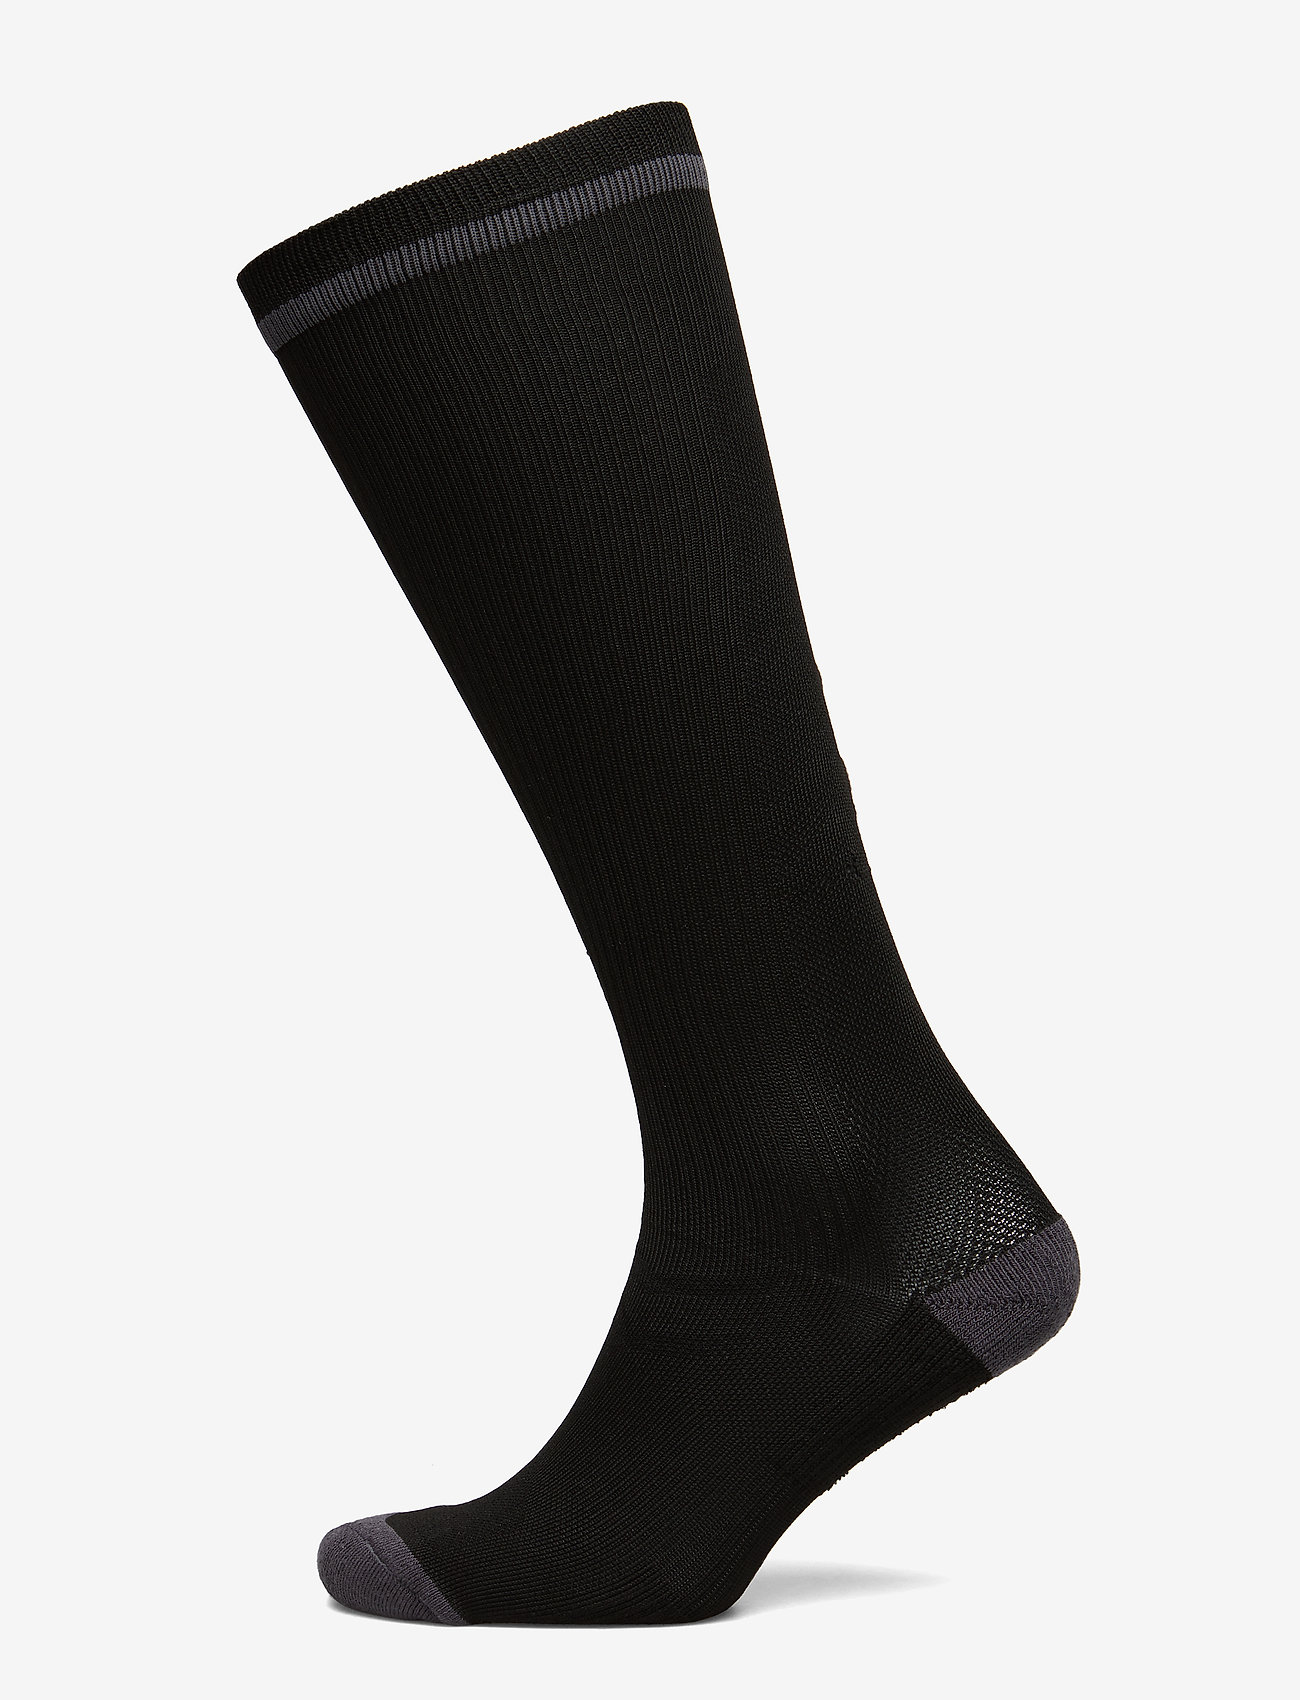 Hummel - ELITE INDOOR SOCK HIGH - jalkapallosukat - black/asphalt - 0